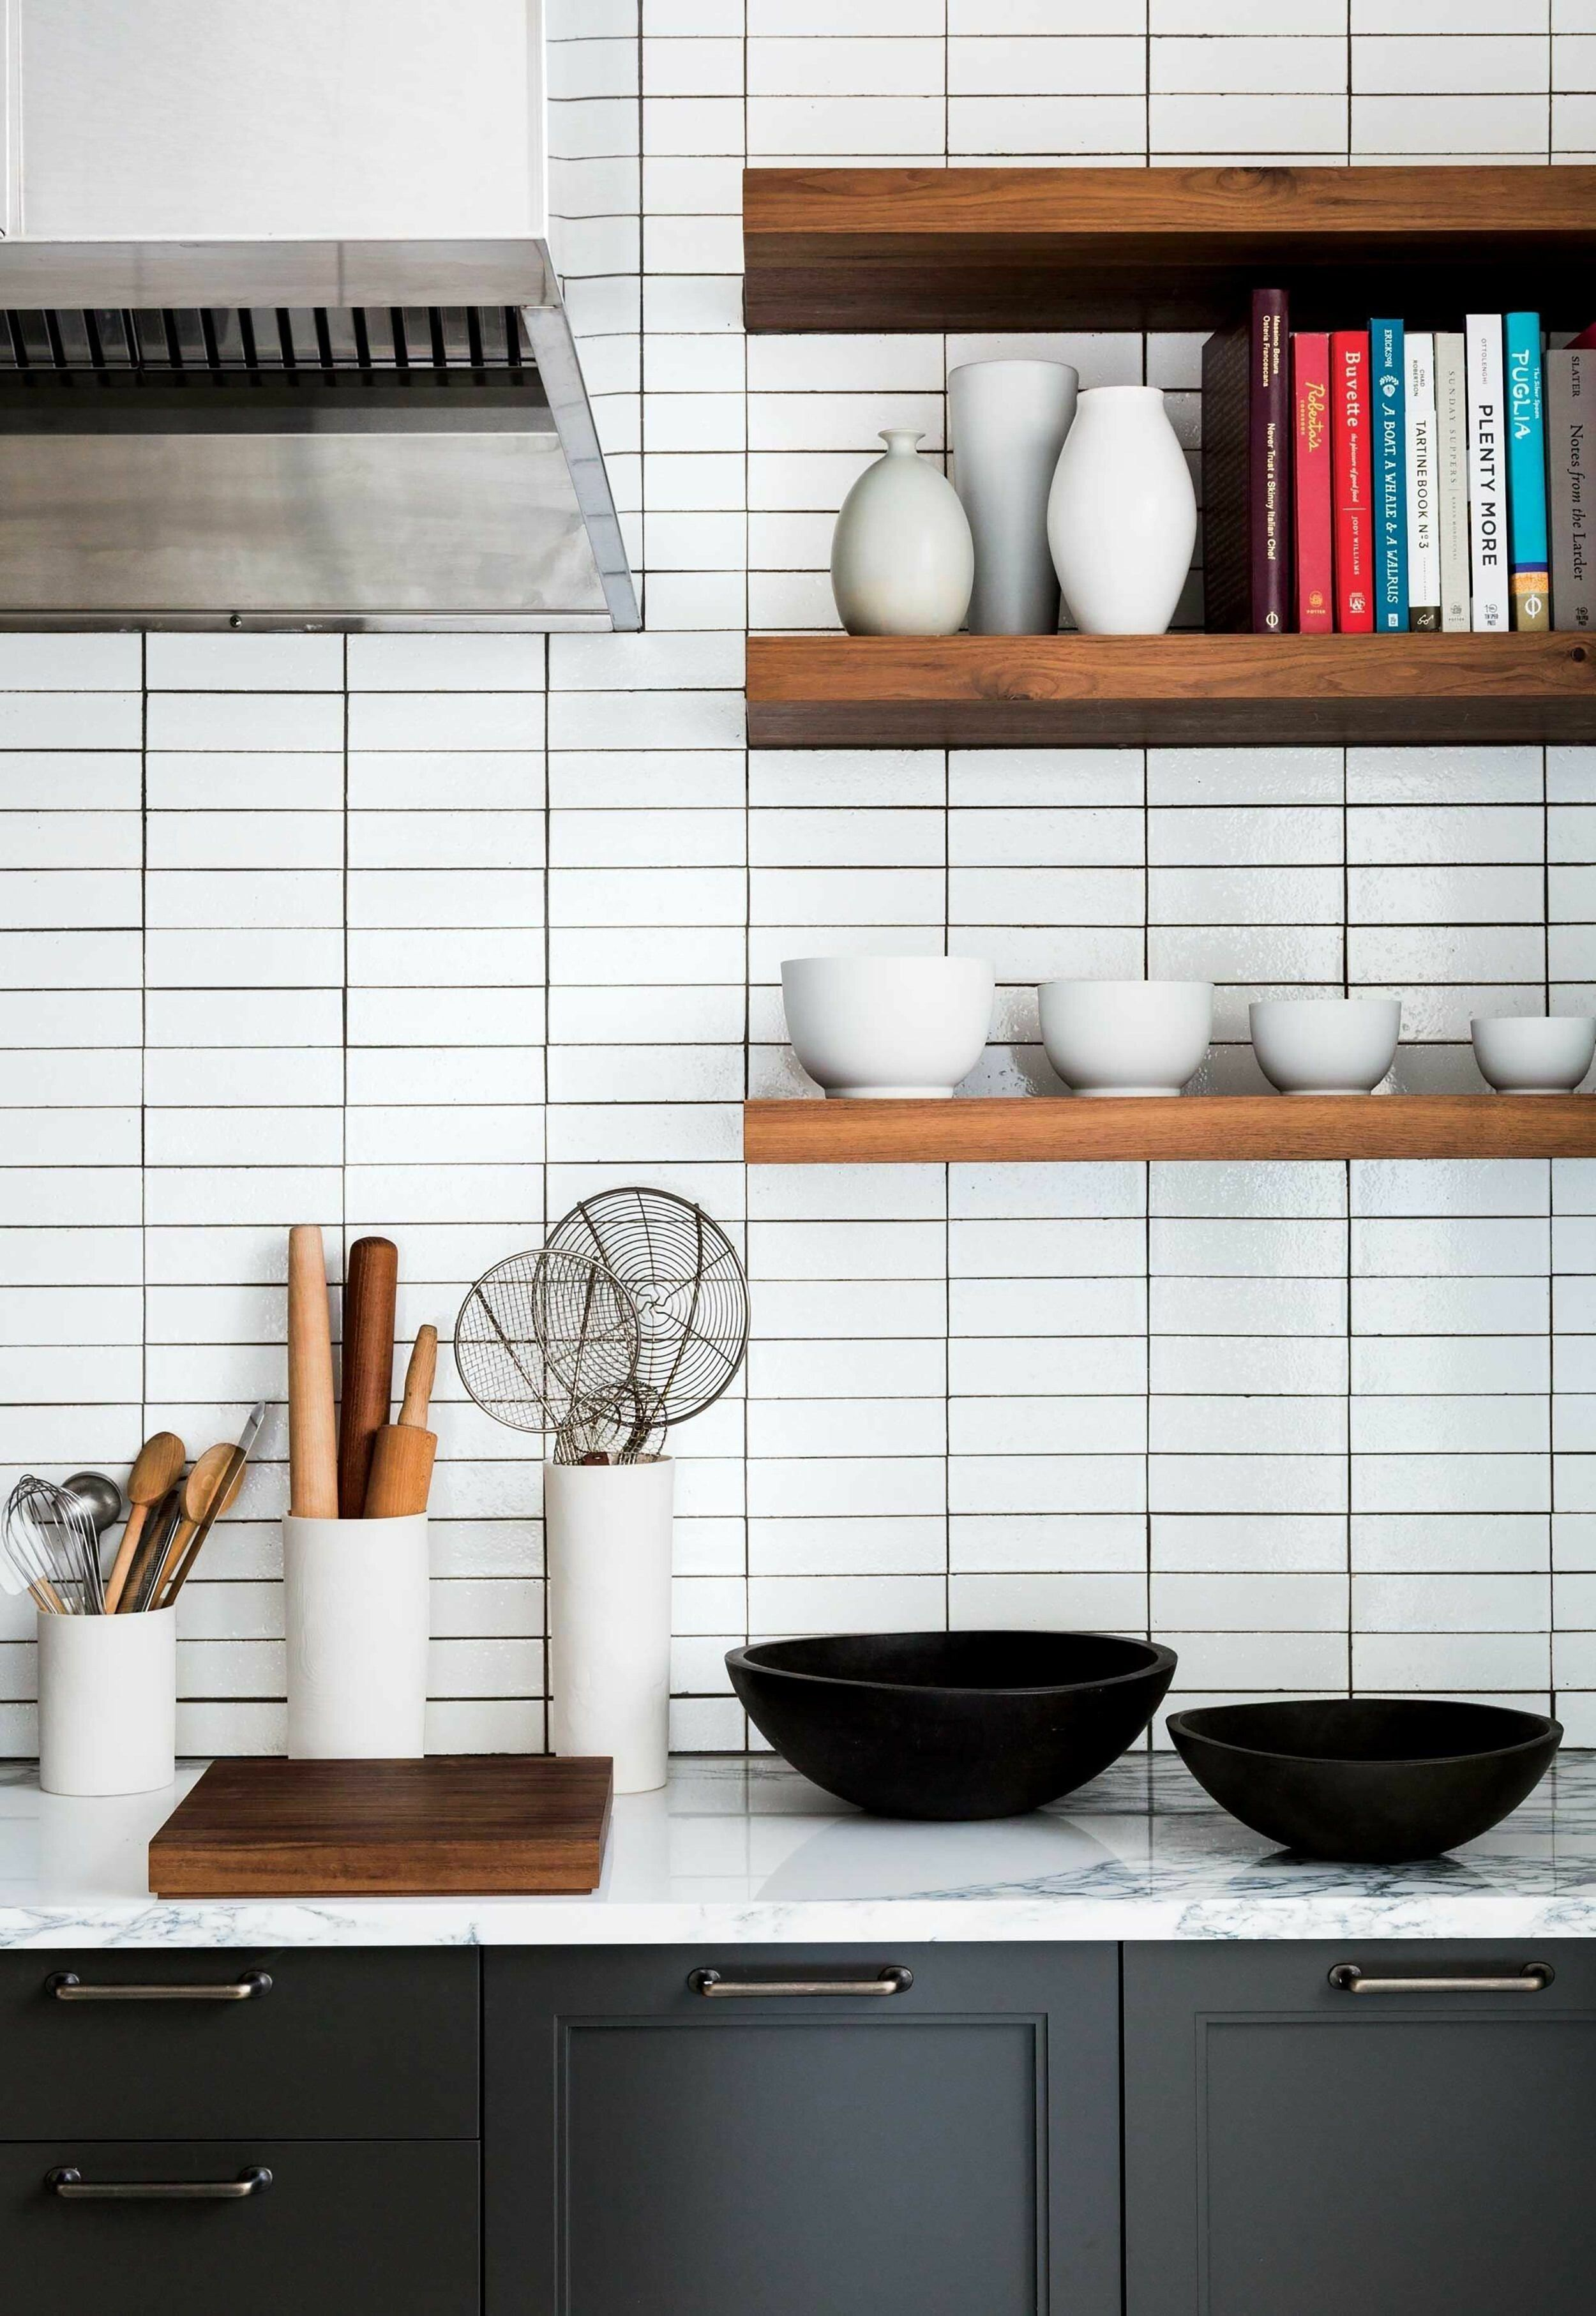 93 Awesome Modern Kitchen Wall Tiles Ideas For Good Kitchen White Subway Tile Kitchen Modern Kitchen Backsplash Kitchen Interior